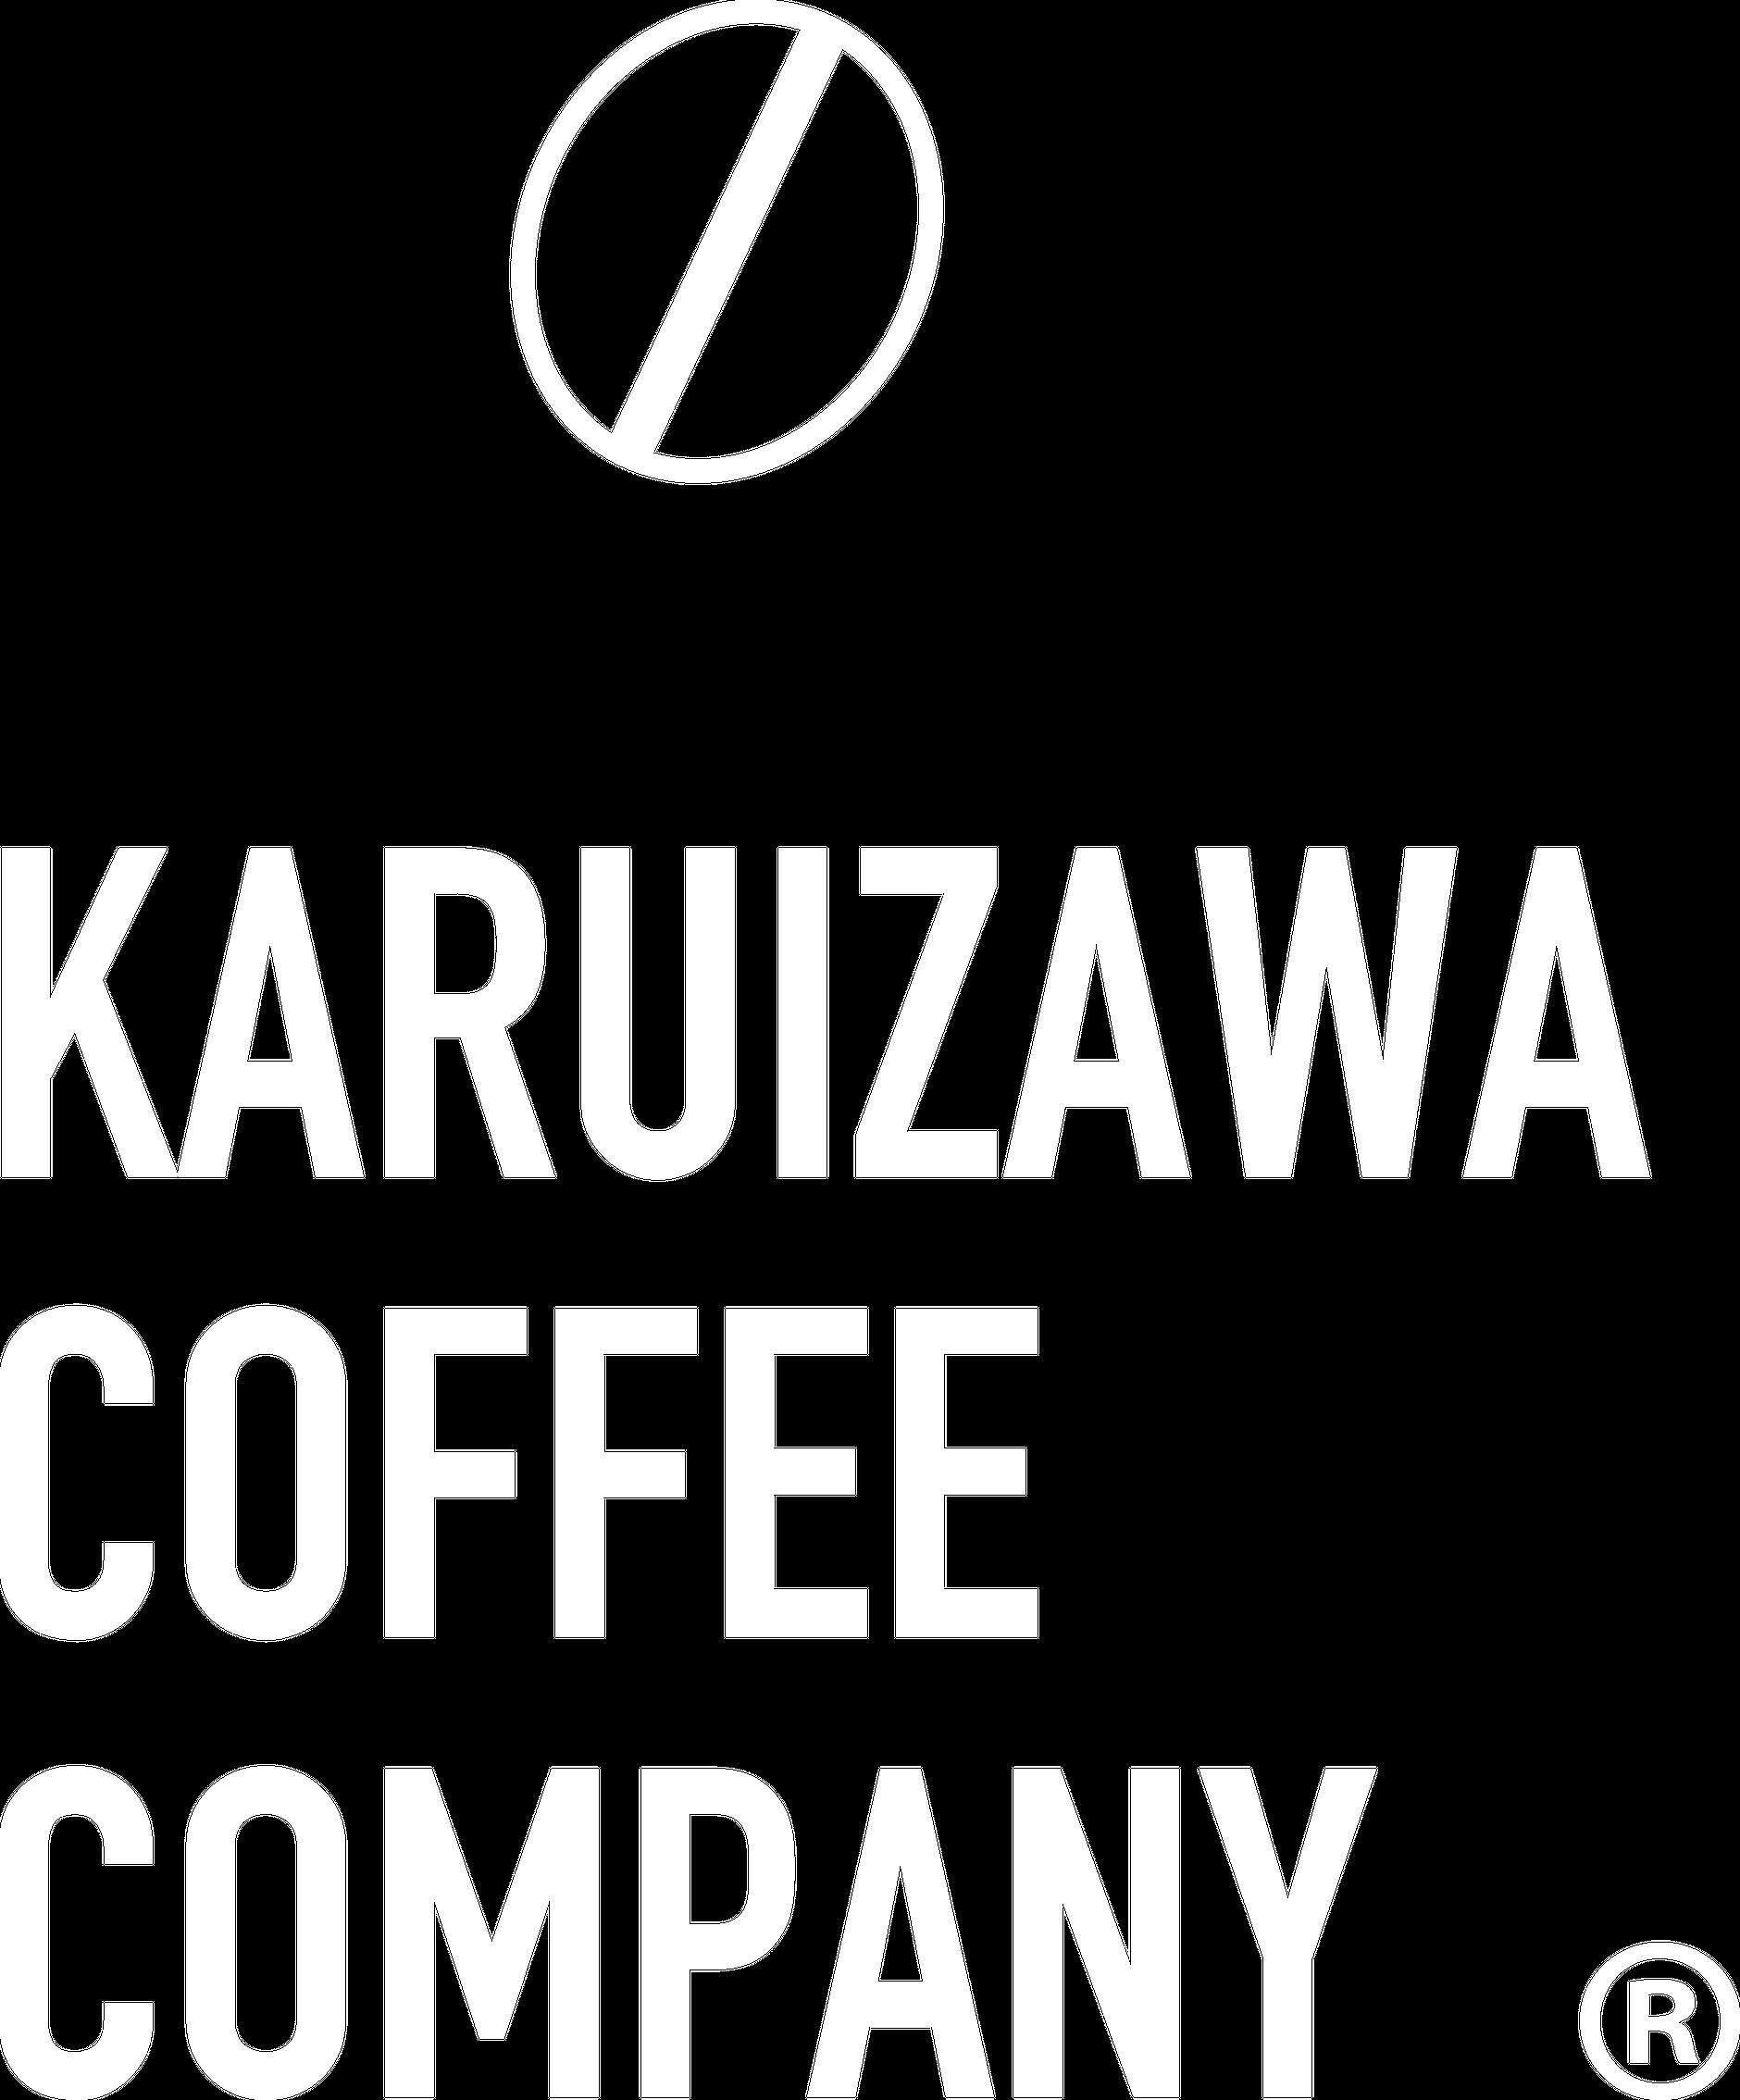 KARUIZAWA COFFEE COMPANY